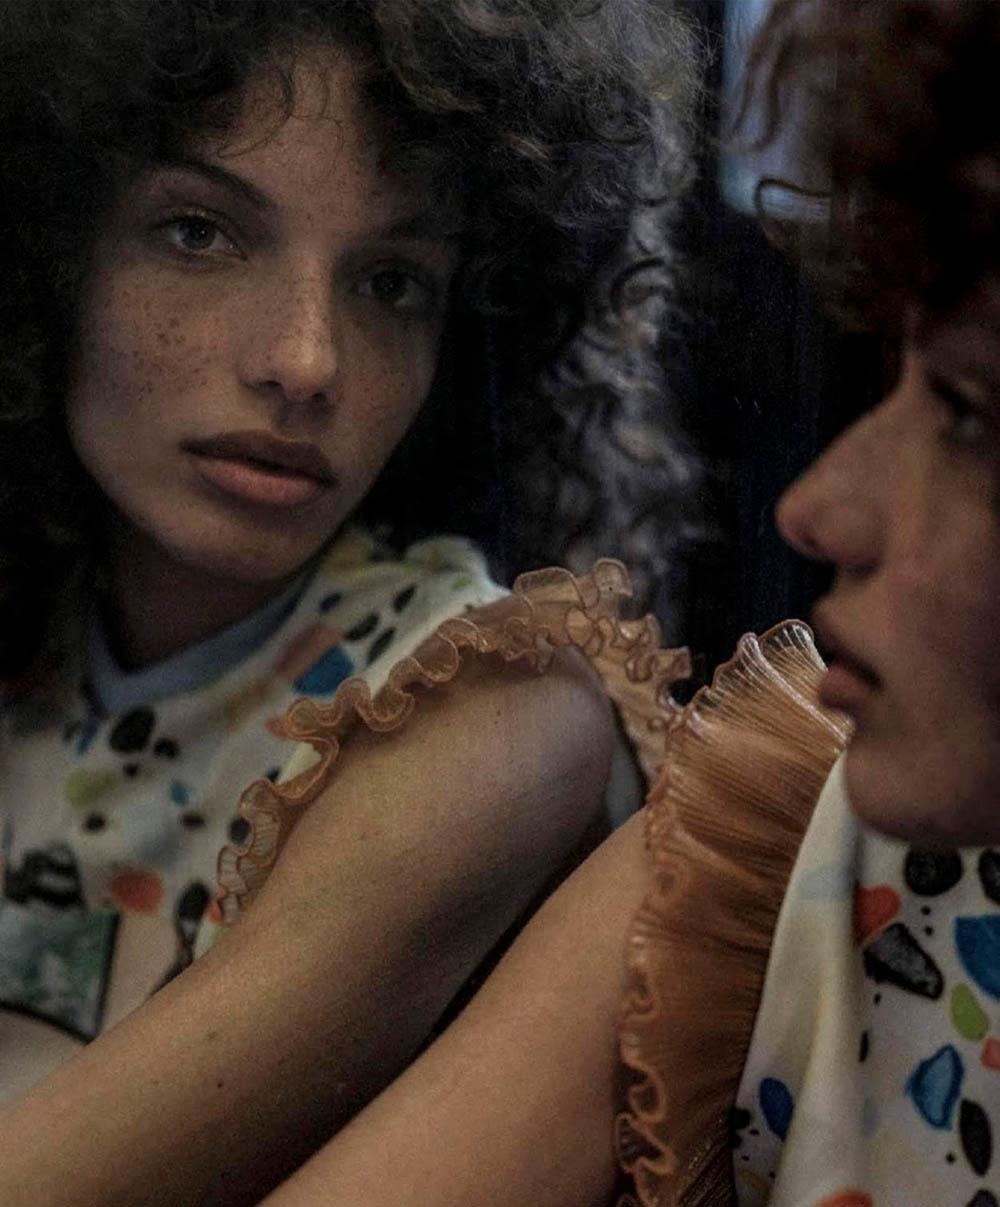 Alicia Herbeth covers L'Officiel Mexico April 2019 by Juankr